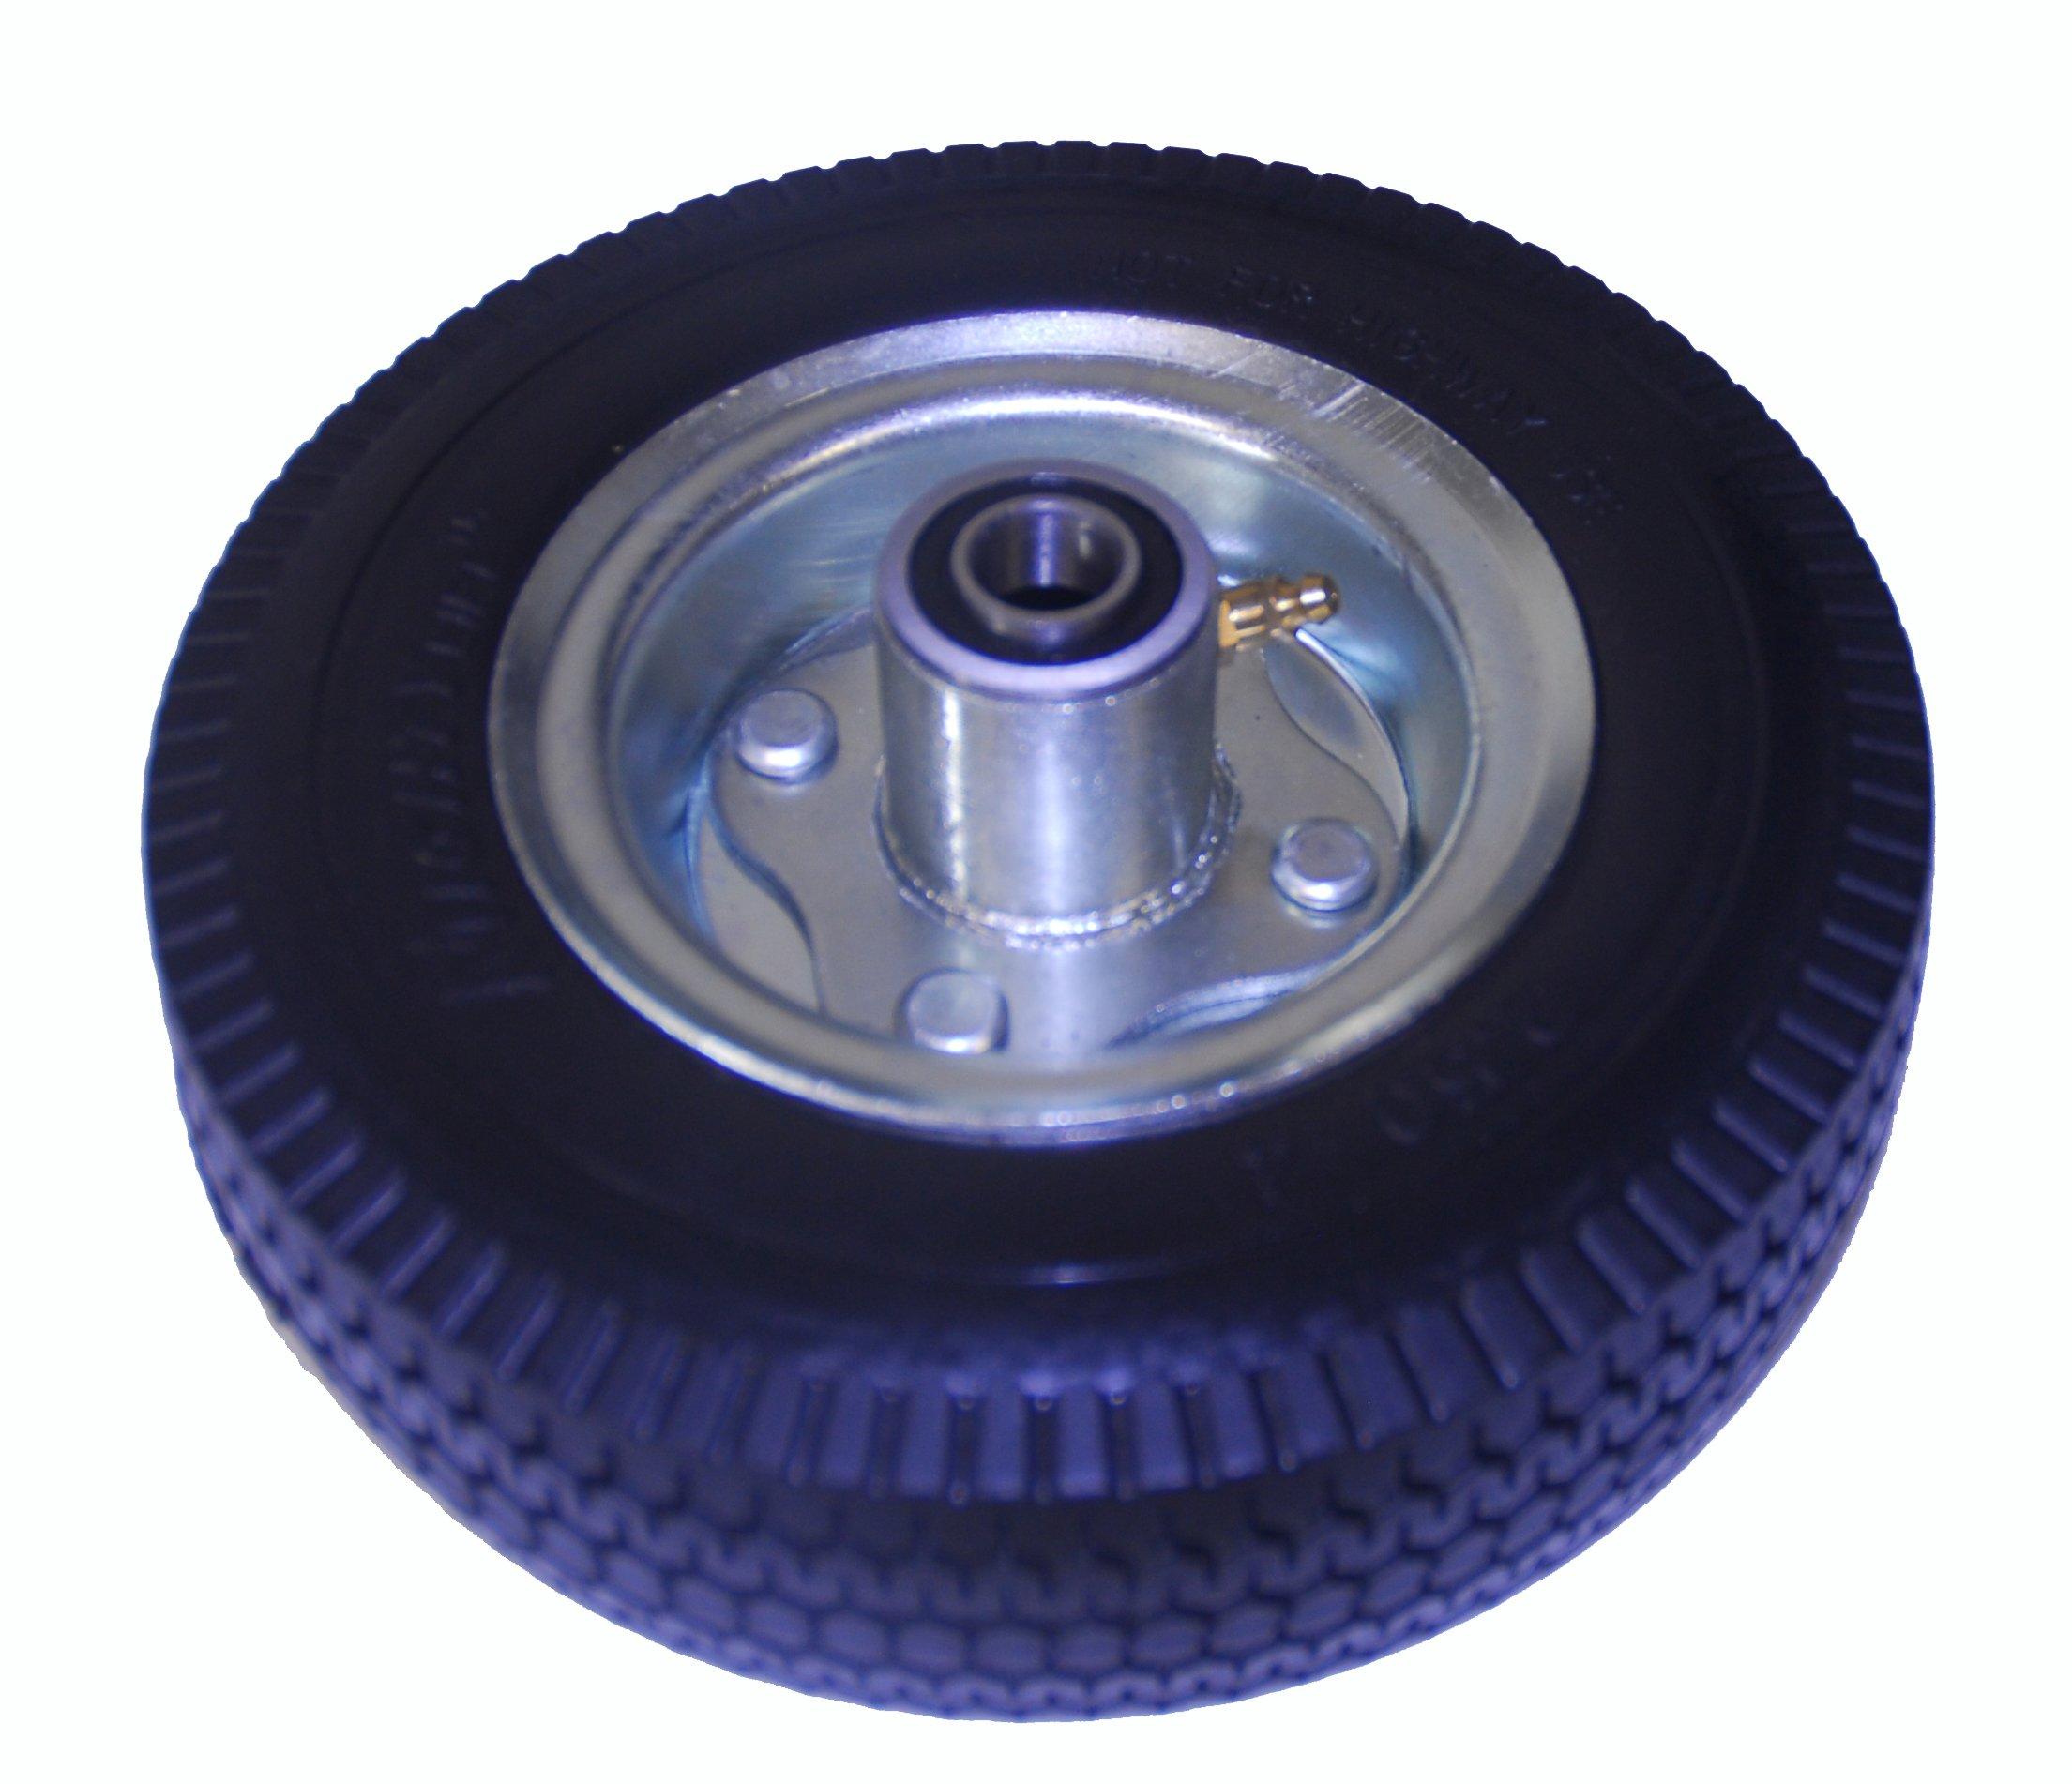 "Mighty Lift 8"" x 2.5"" Hand truck wheel, Flat Free, Tubeless, 4.10/3.50-4"" poly Tire, 2-1/4"" Offset Hub, 5/8"" Precision Bearing, 350 lbs cap"